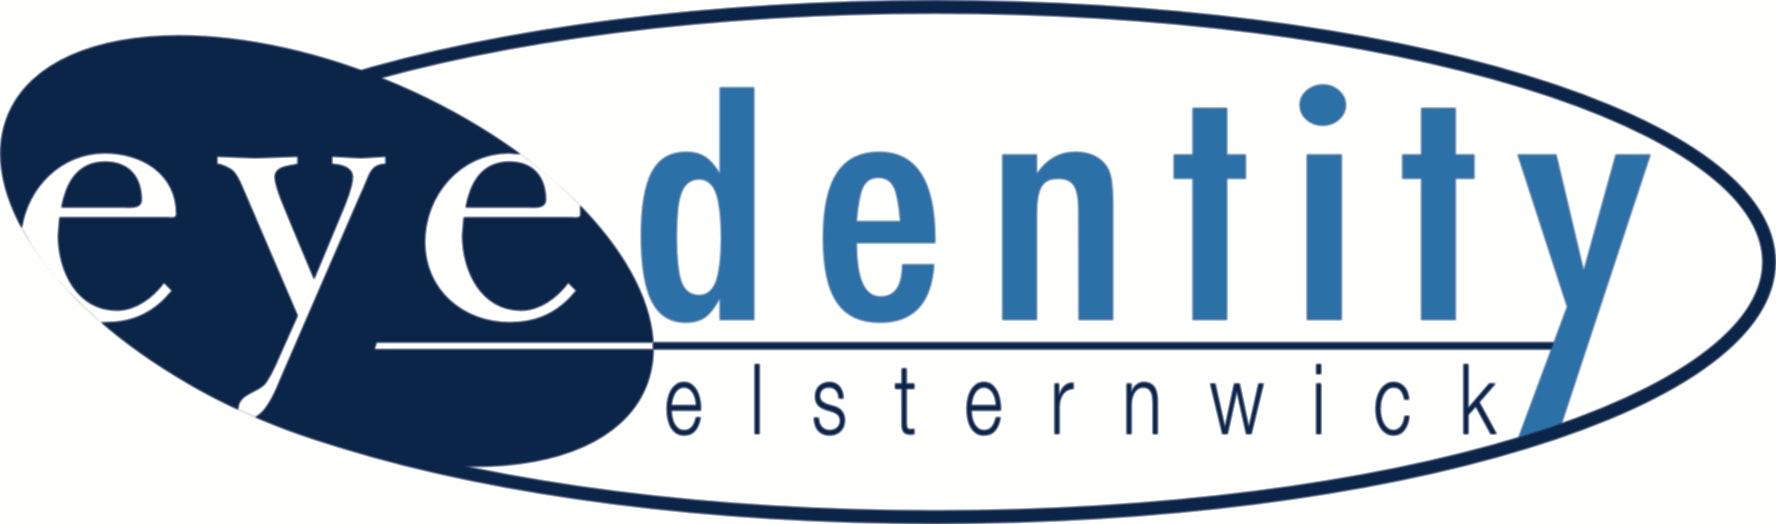 logo for Eyedentity Elsternwick Optometrists